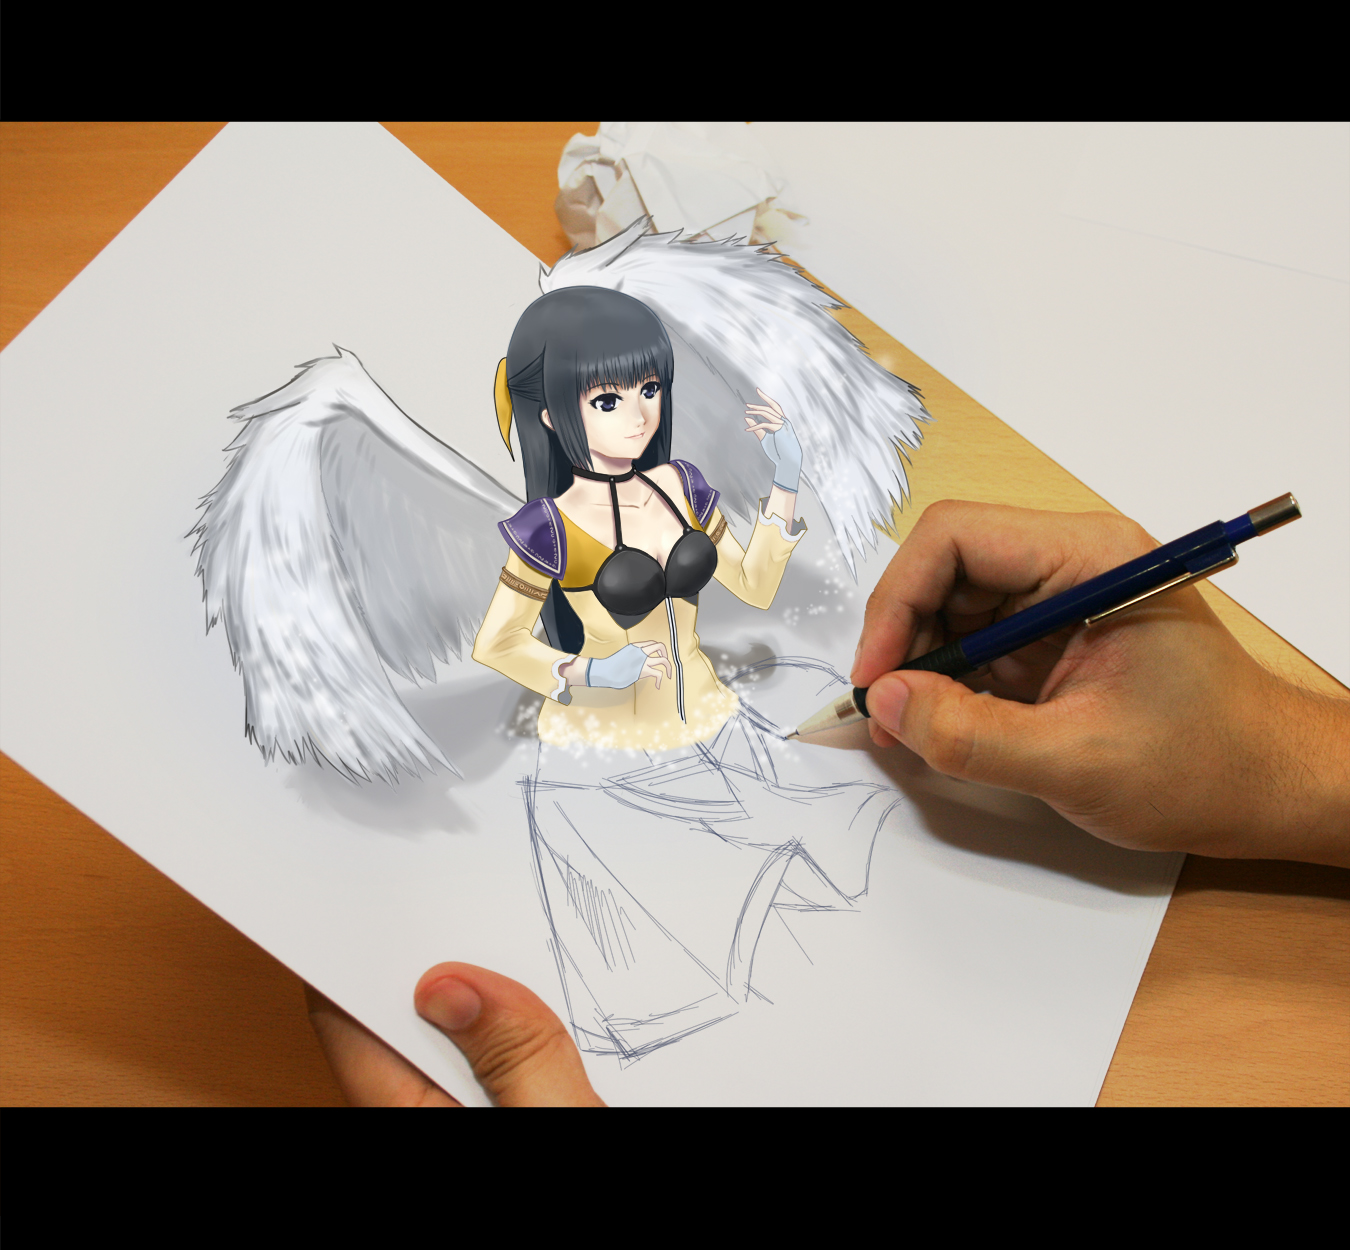 Sentient Imagination by mvp-Otaku